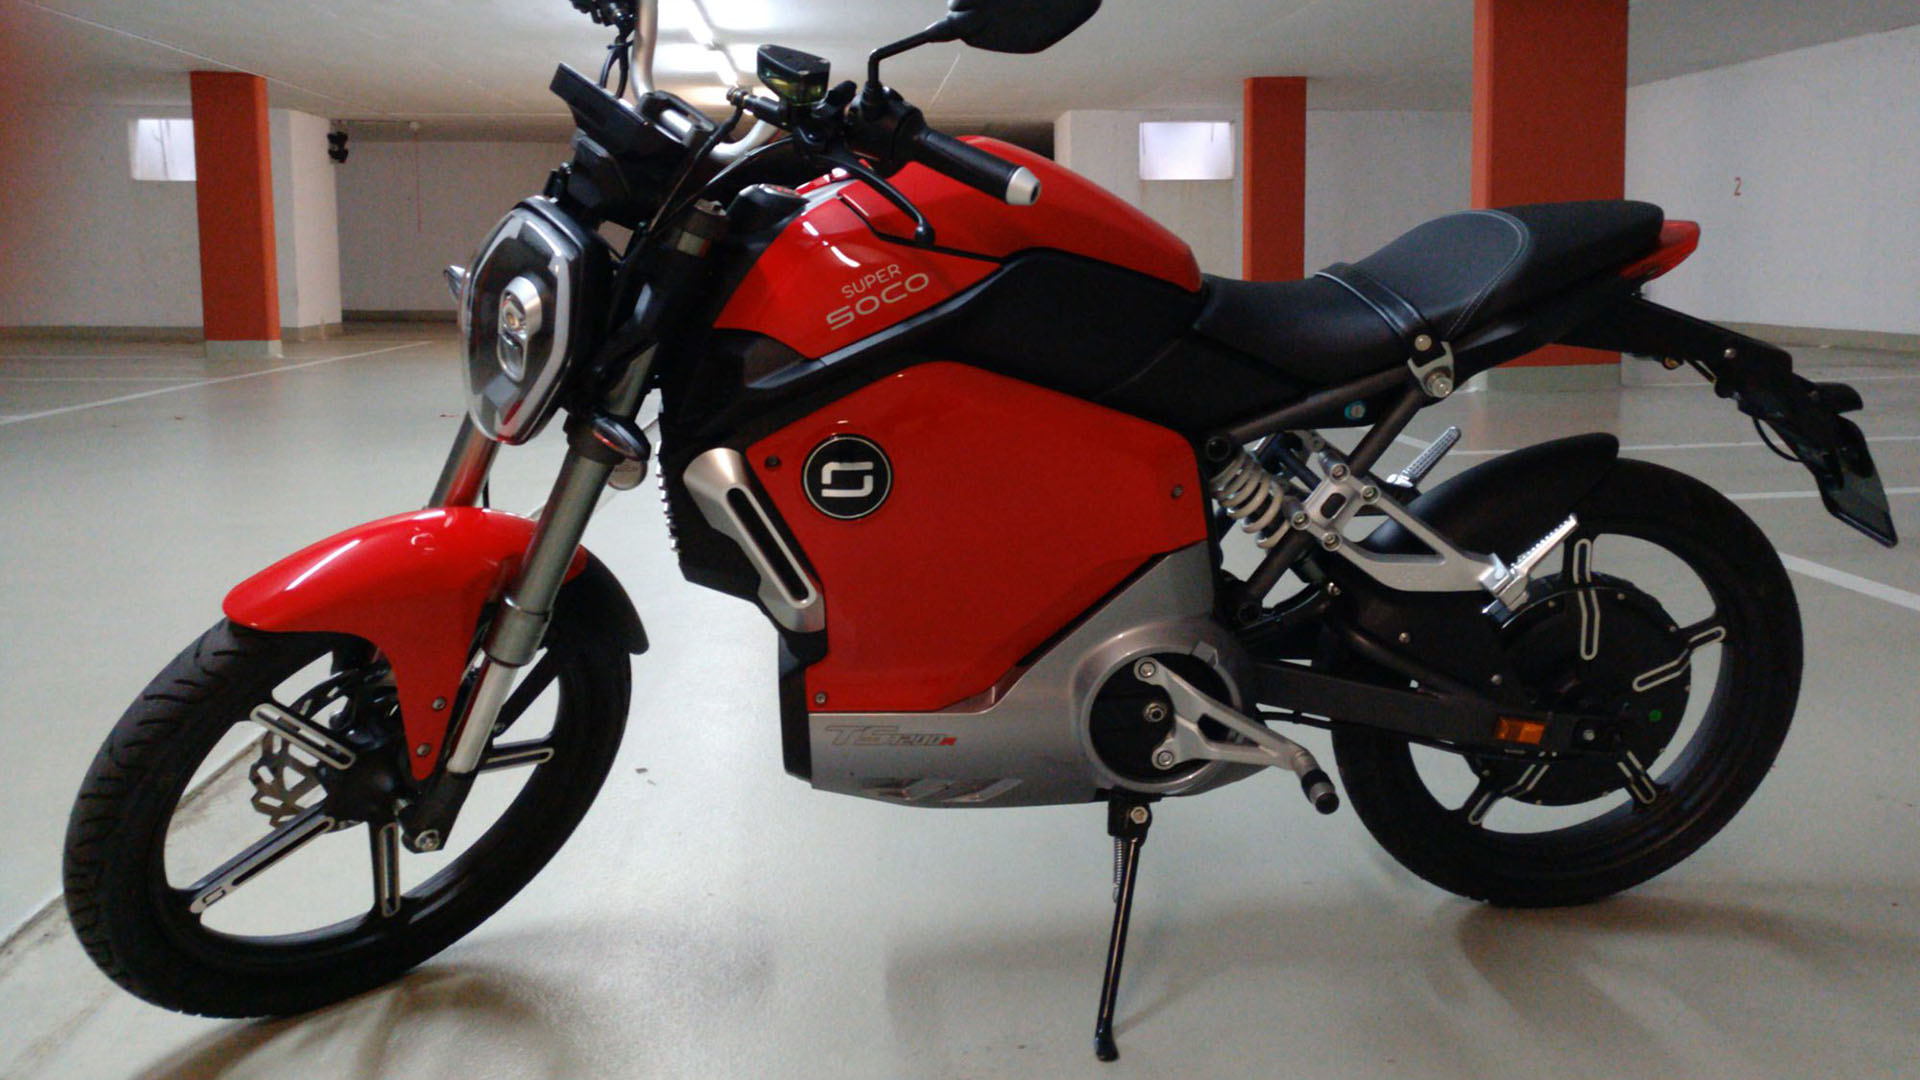 Super SOCO TS1200R